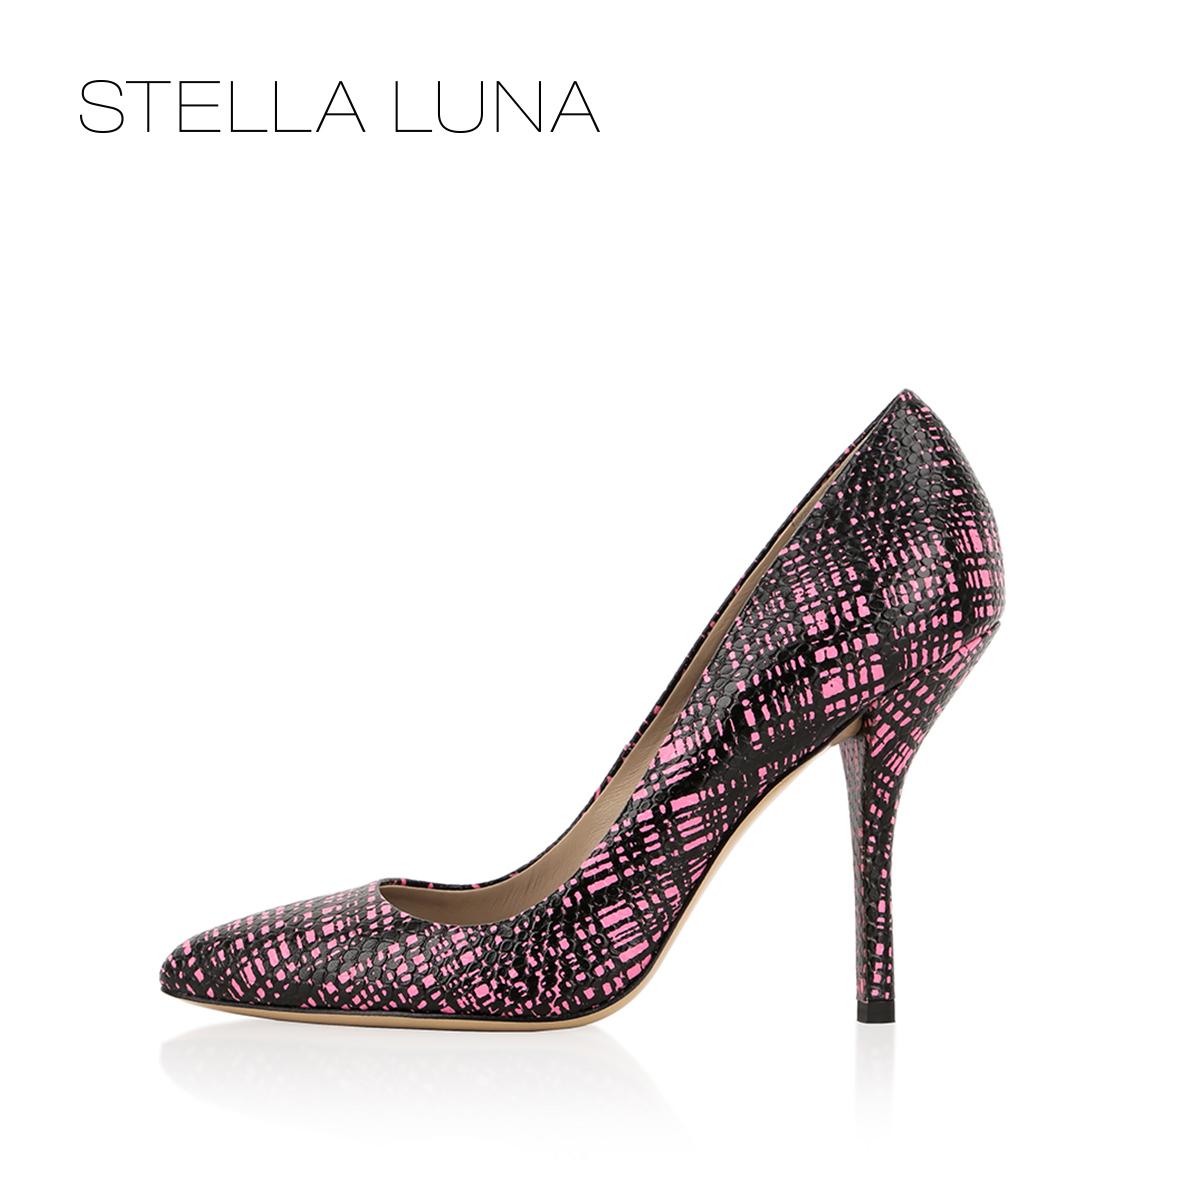 STELLA LUNA女鞋春夏时尚细跟鞋子女牛皮尖头超高跟鞋SF133L01013